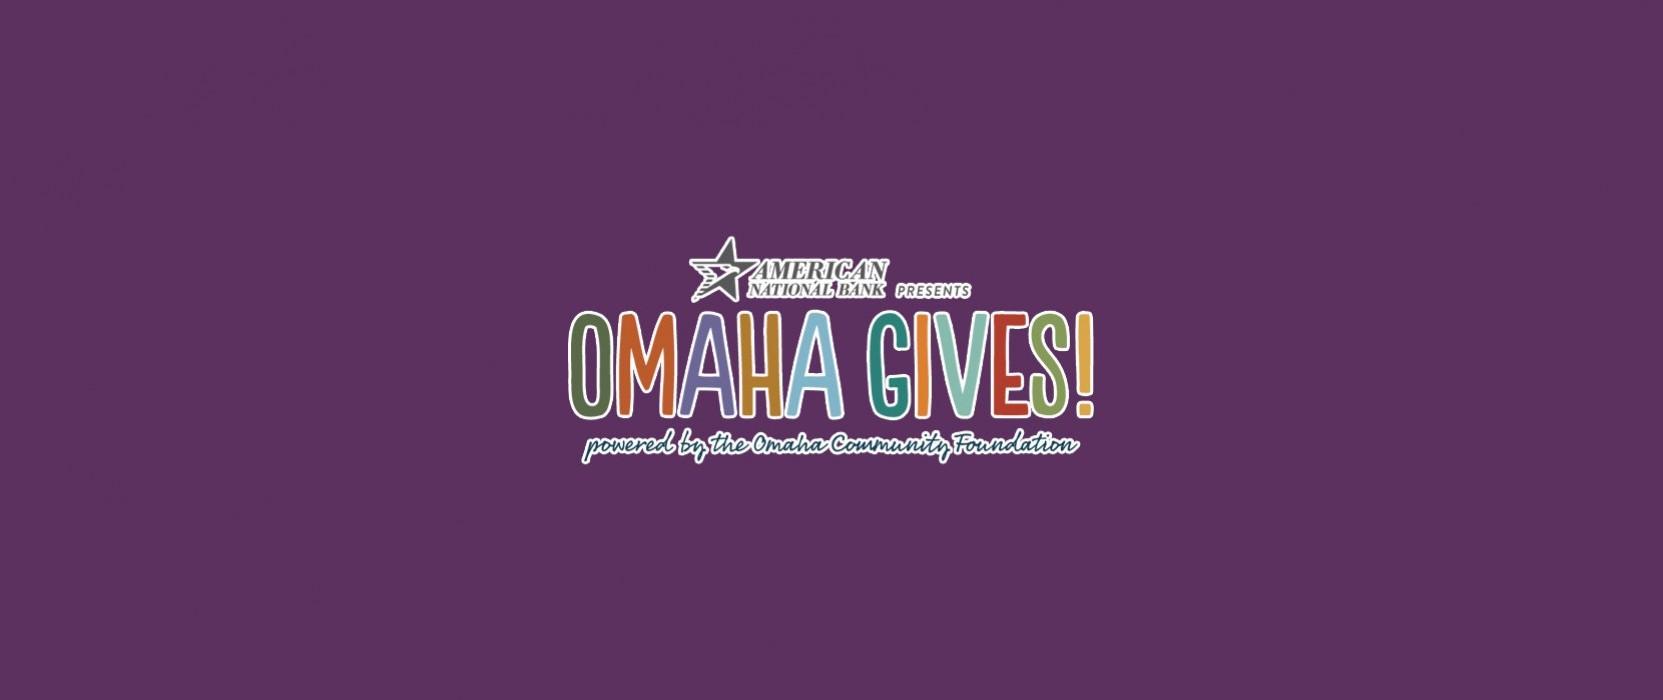 Madonna's Omaha Campus celebrates Omaha Gives